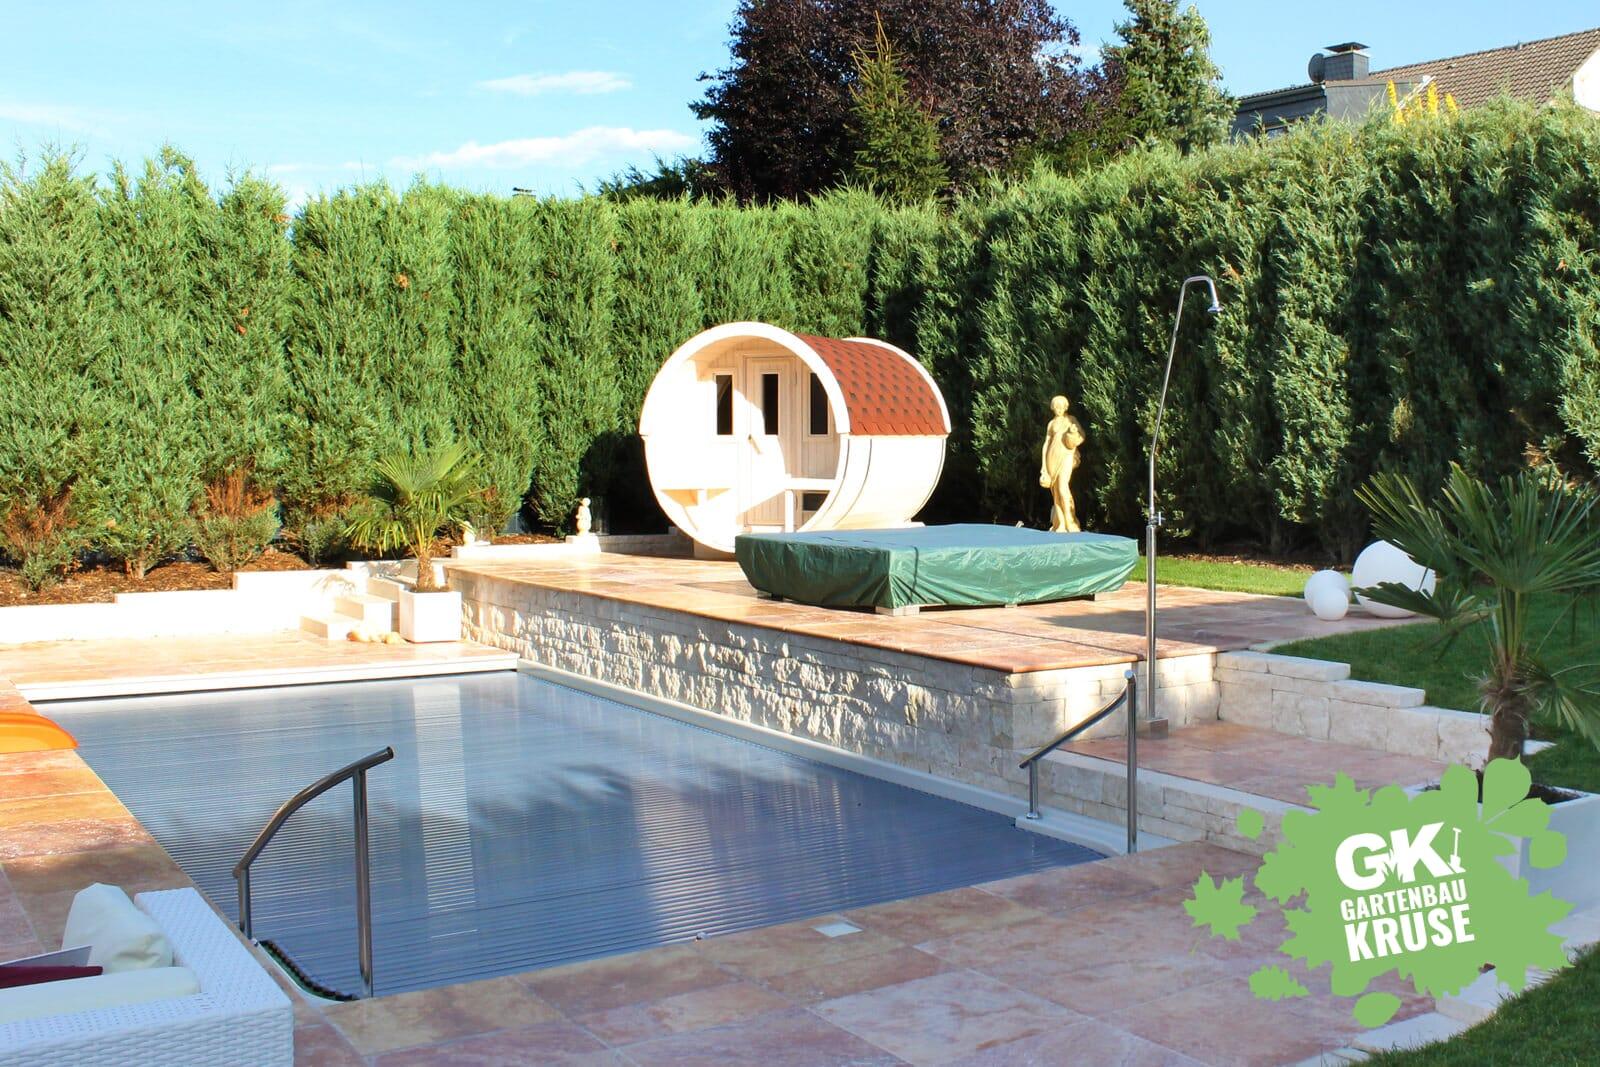 Poolbau Schwimmbadbau Gartenbaukruse De Polyester Gfk Beton